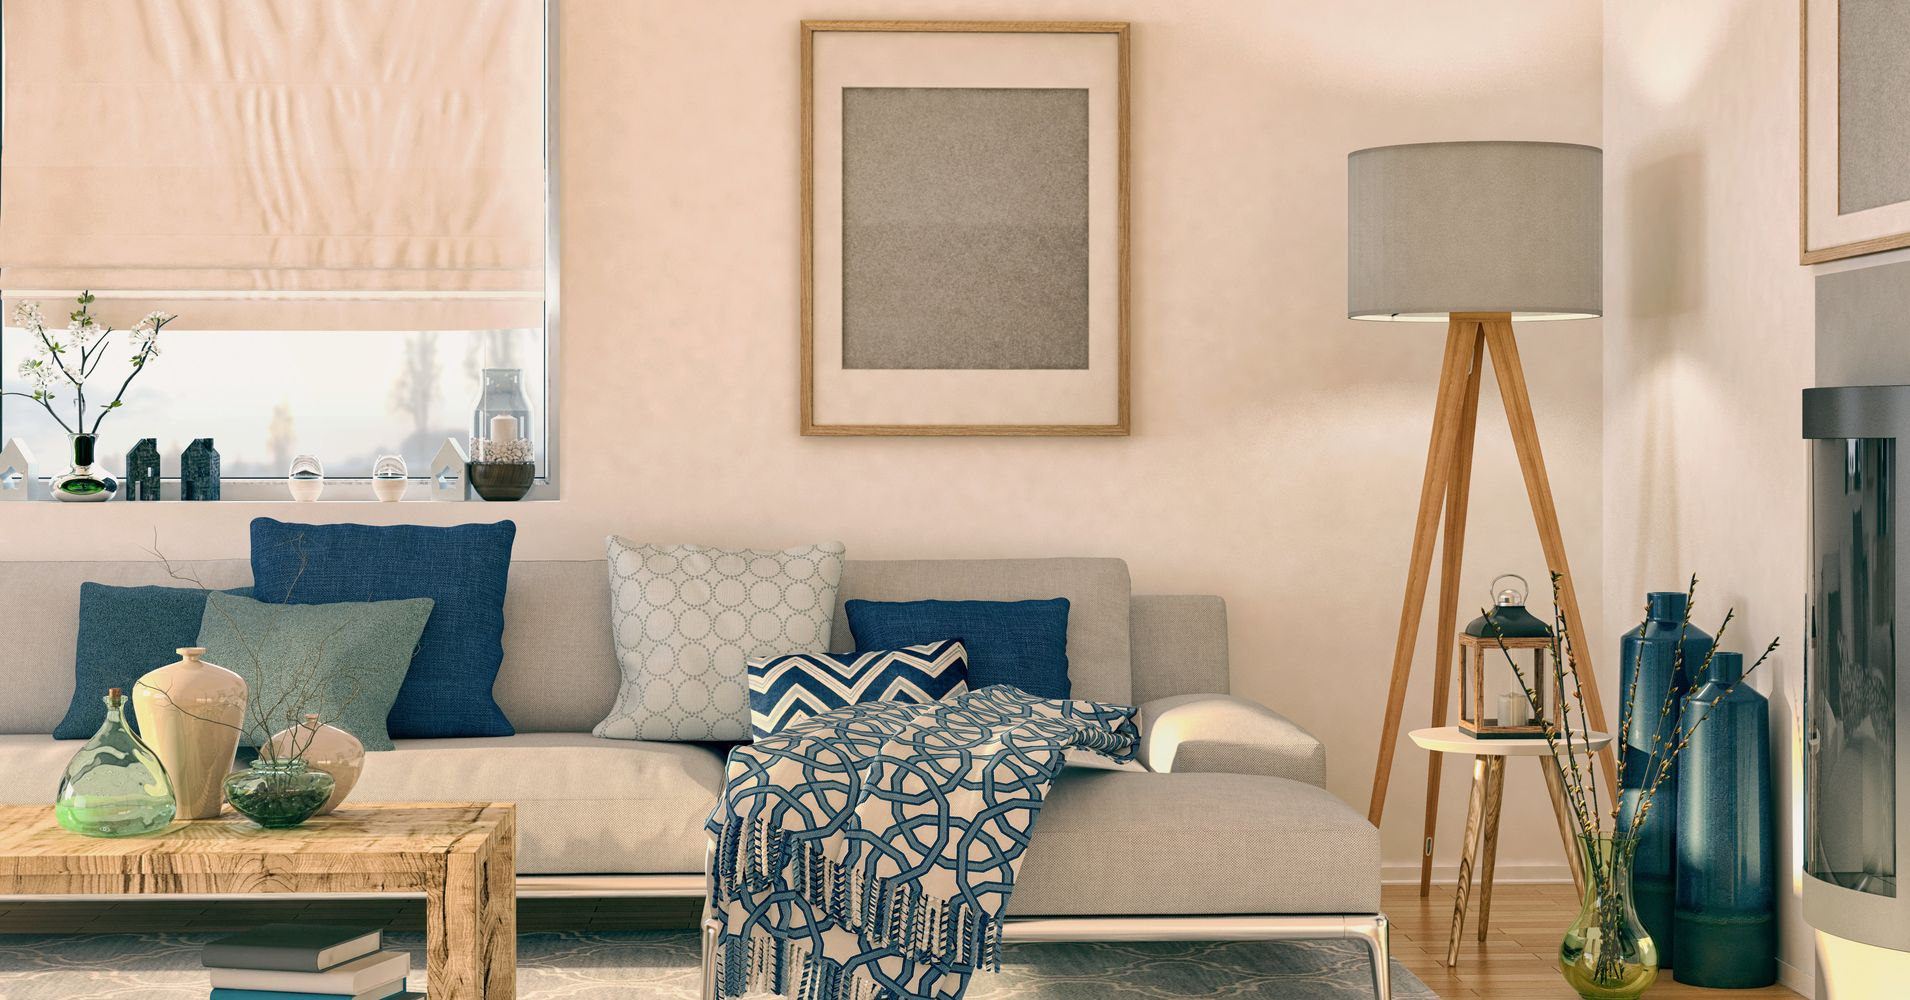 The best stores to buy scandinavian furniture online - Best online furniture stores ...